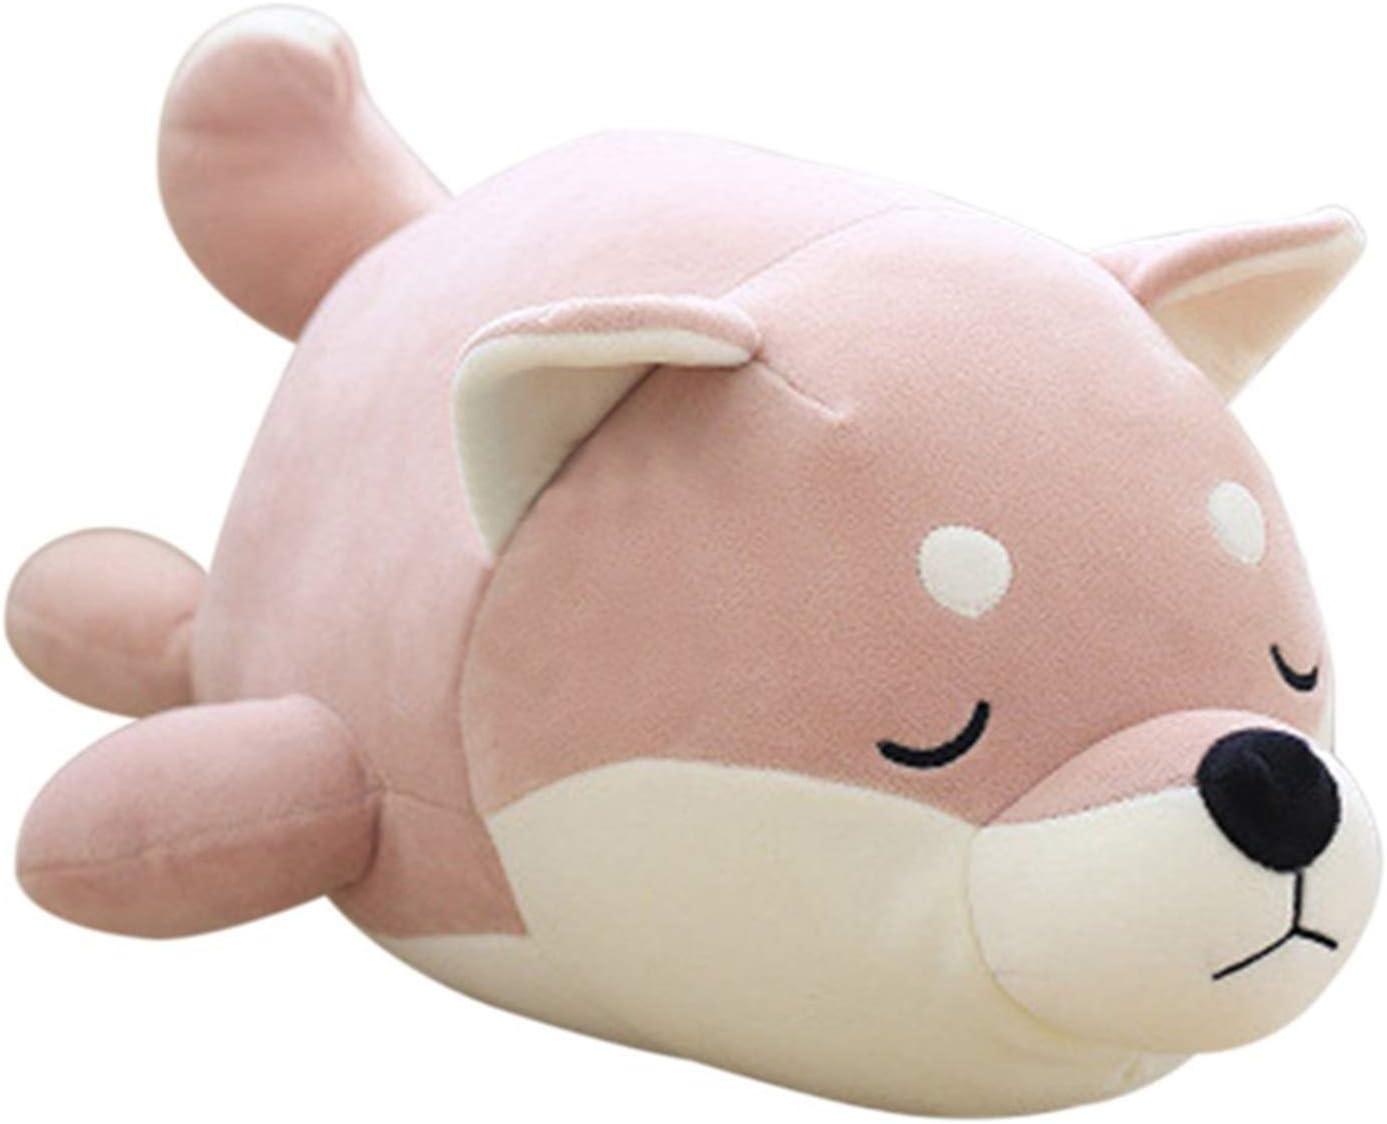 Molizhi Cute Anime Plushies Stuffed Animal Shiba Inu Plush Corgi Kawaii Plush Toys Hugging Pillow Dog Pillow Gift for Women Men Kids Boys Girls (Bean Paste, 13.8